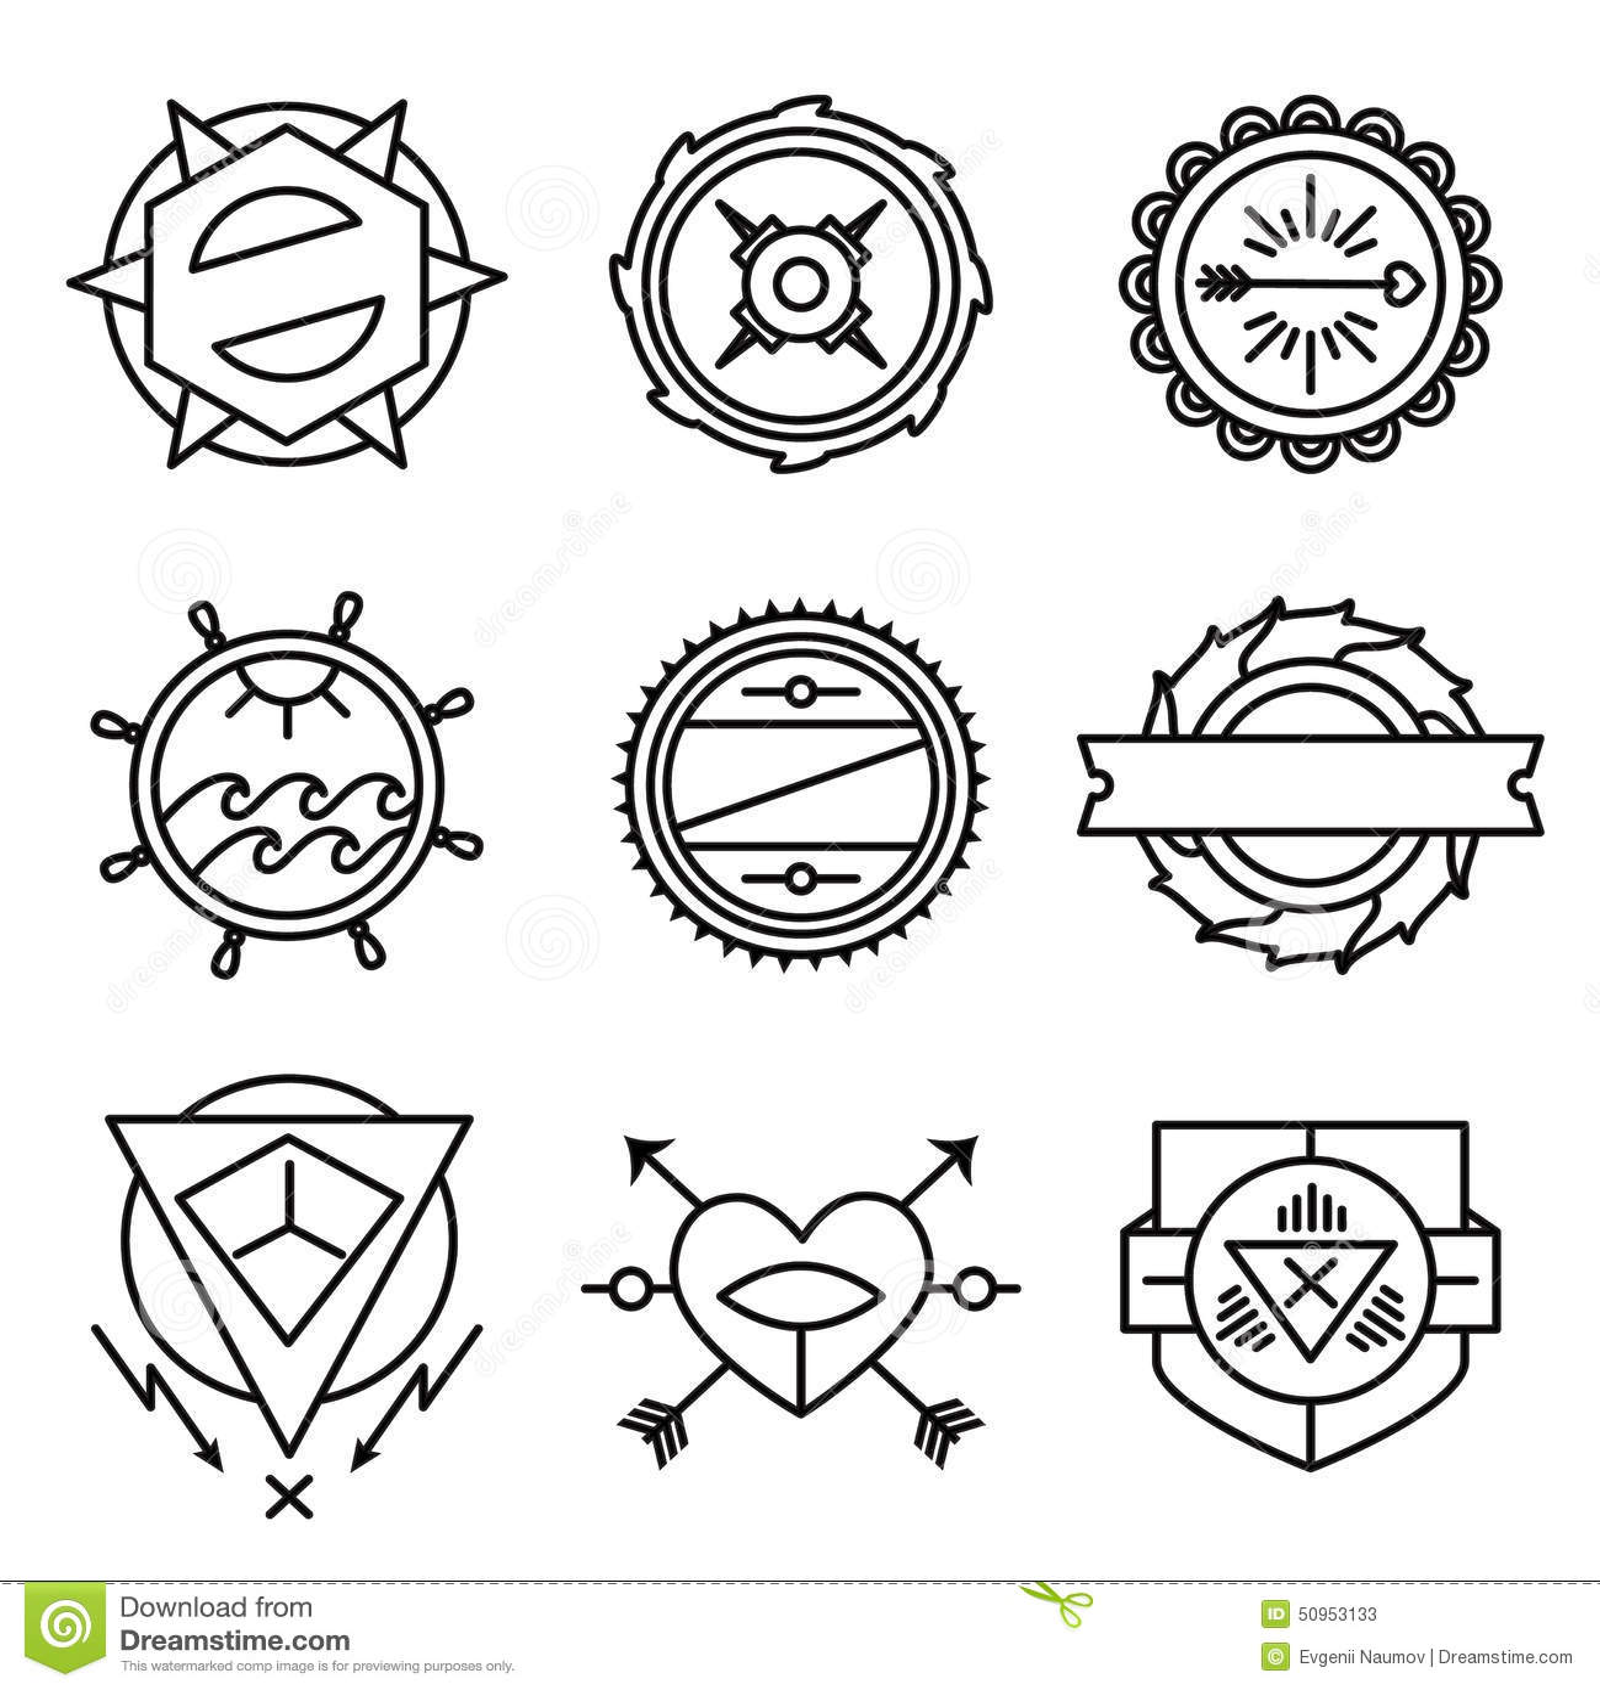 Monochrome Schematic Illustration Vector Illustration